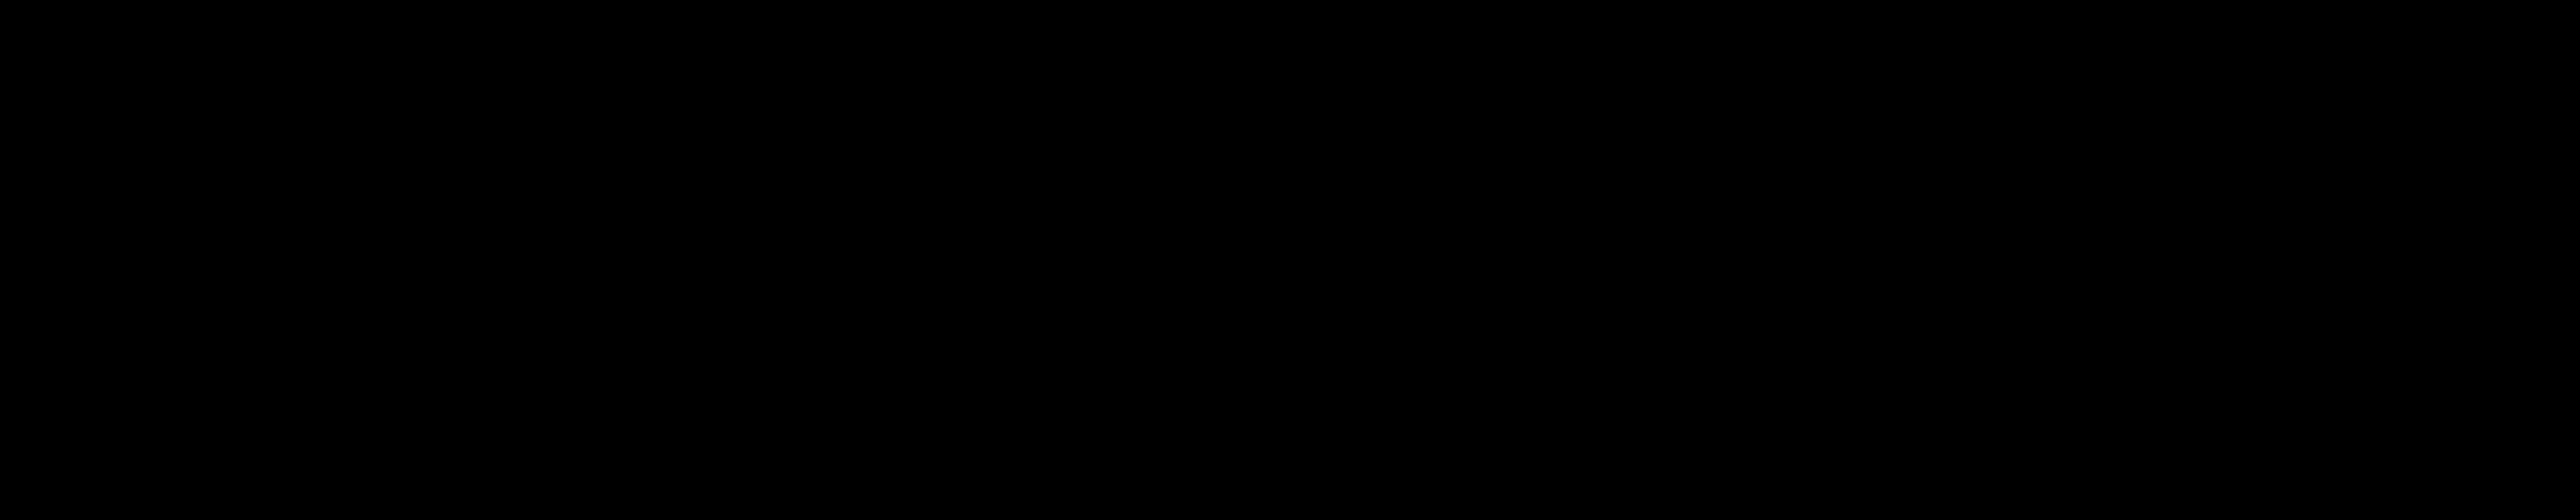 N-Methanethiosulfonylethylene-N<sub>6</sub>-(6-biotinamidocaproyl)lysineamido-N-α-ammonium Trifluoroacetic Acid Salt